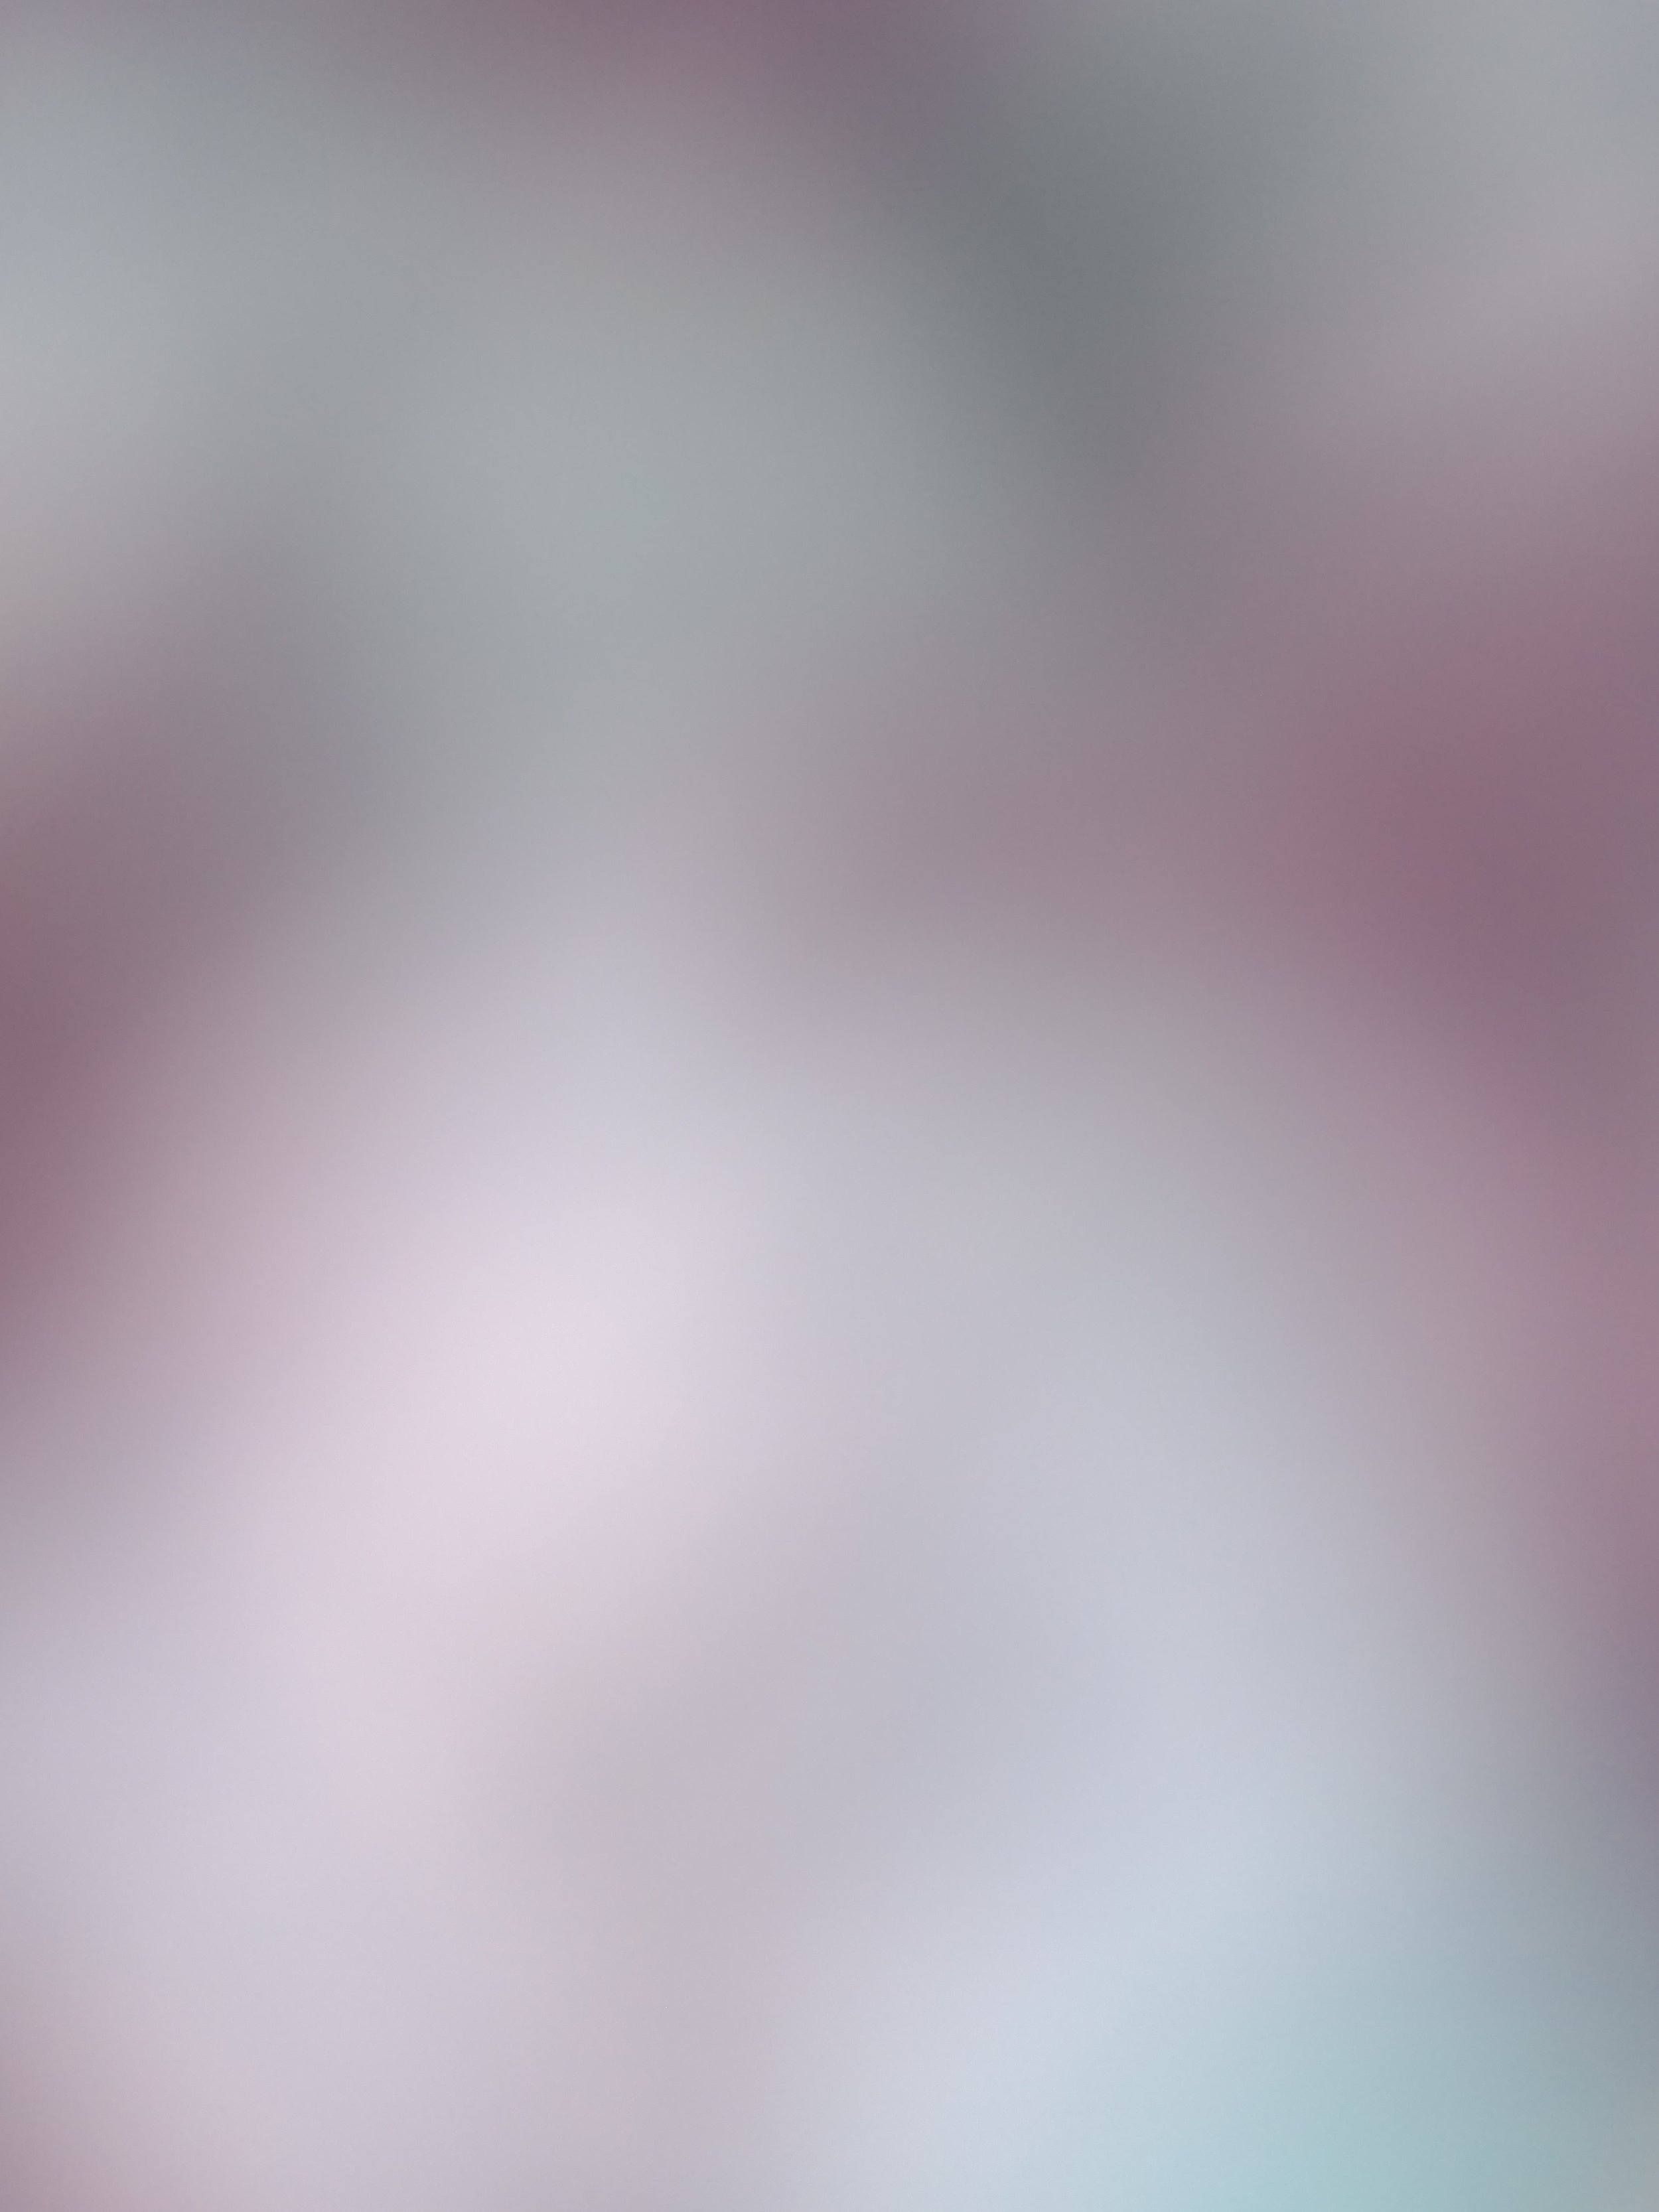 willroth-co-free-texture-gradient-005.jpg